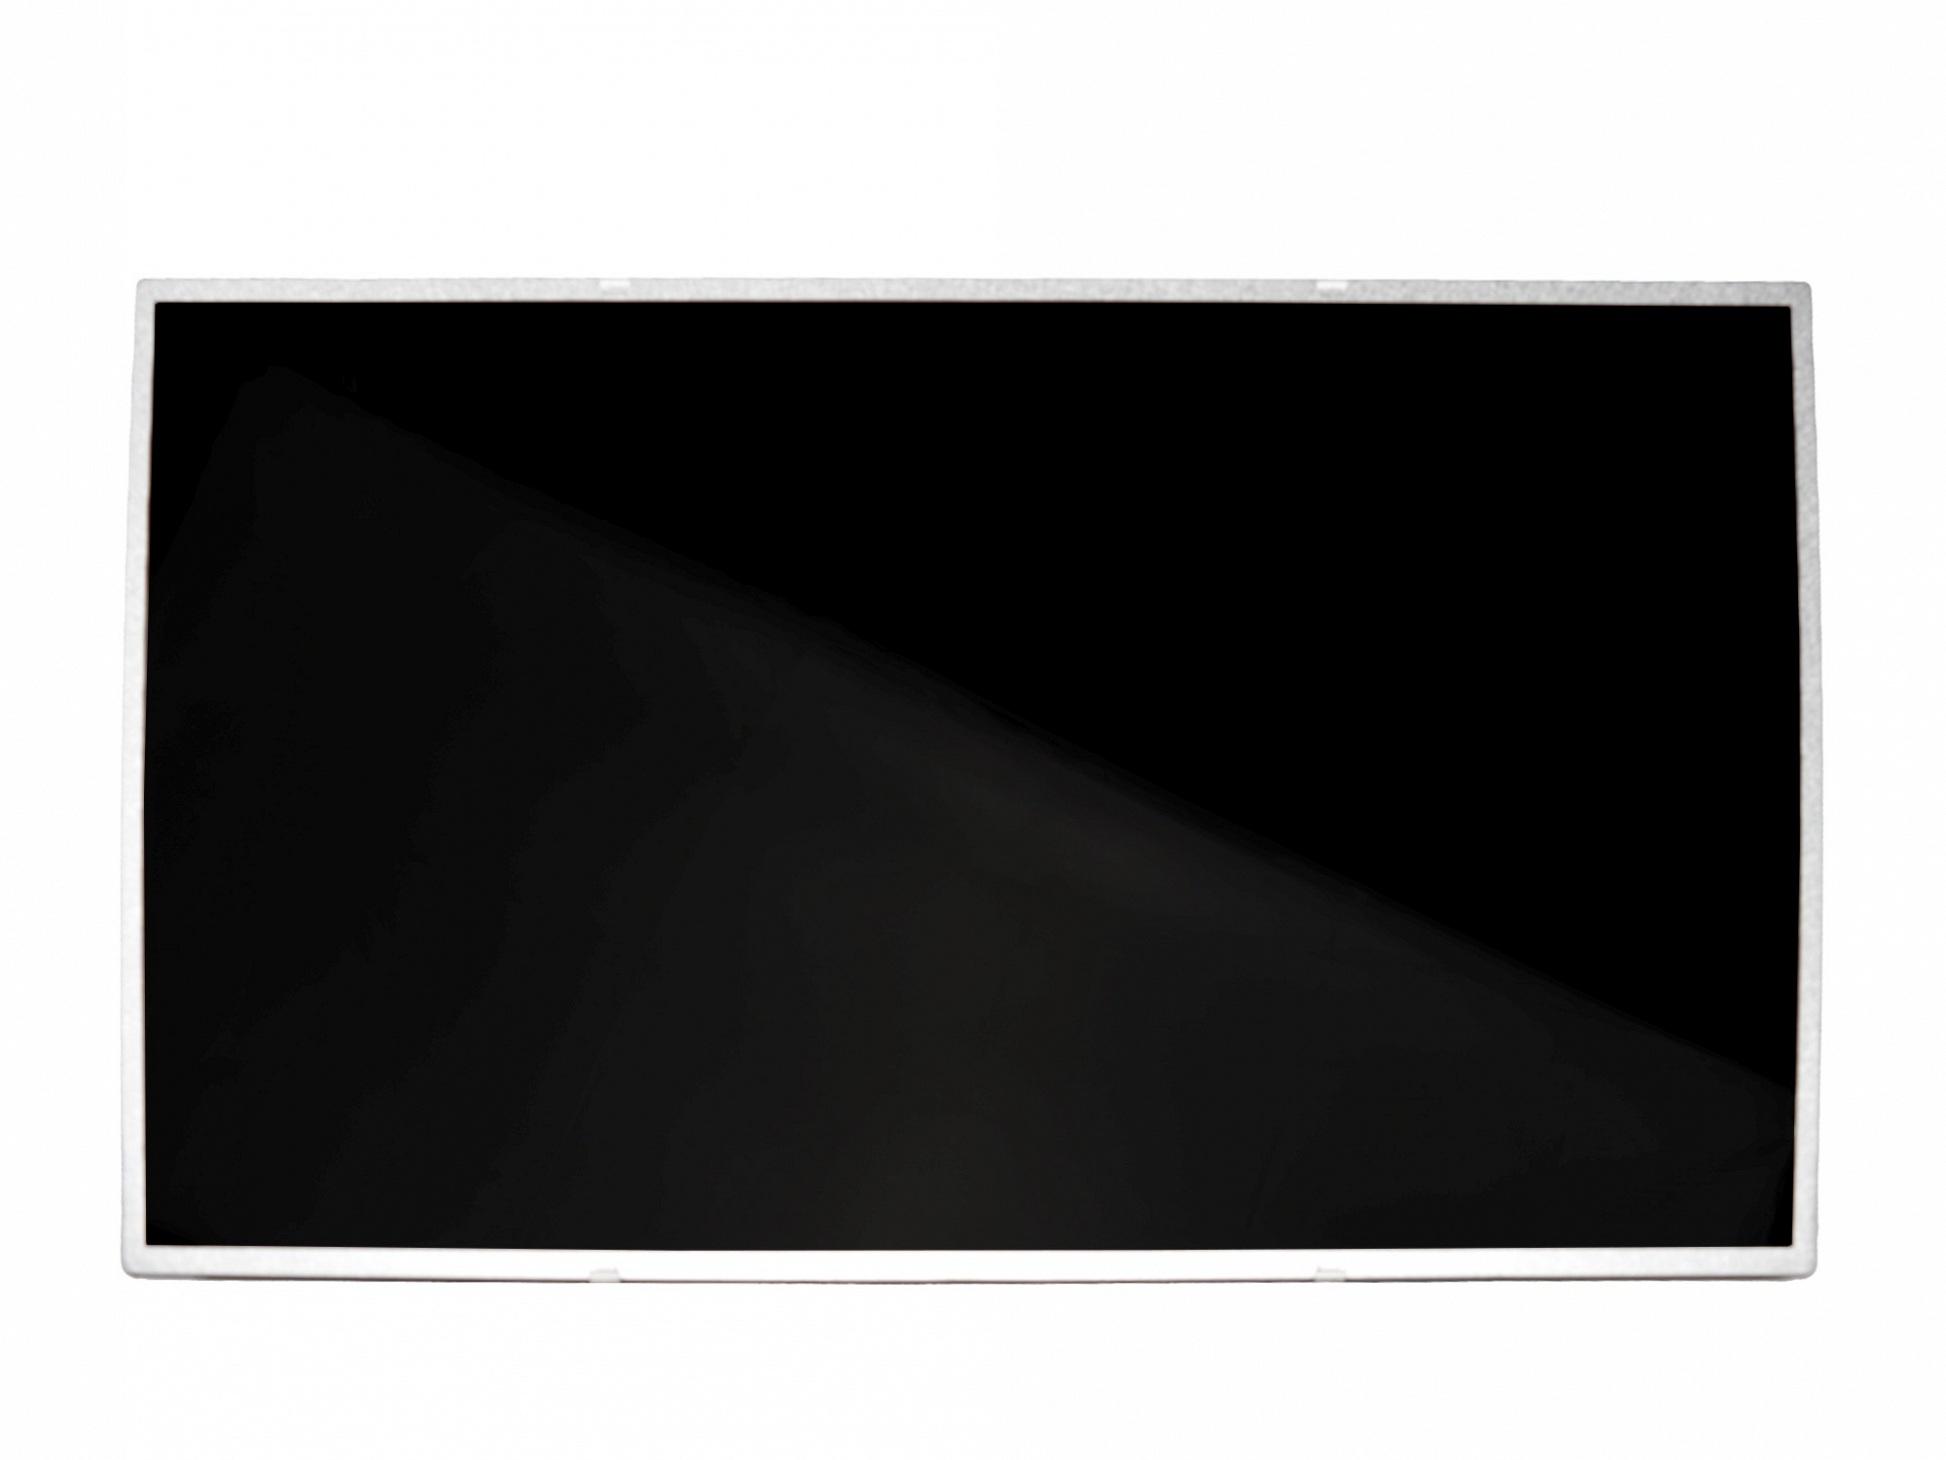 Display 15,6 Zoll HD glare LED inkl. Einbau für Wortmann Terra Mobile 1509 Serie